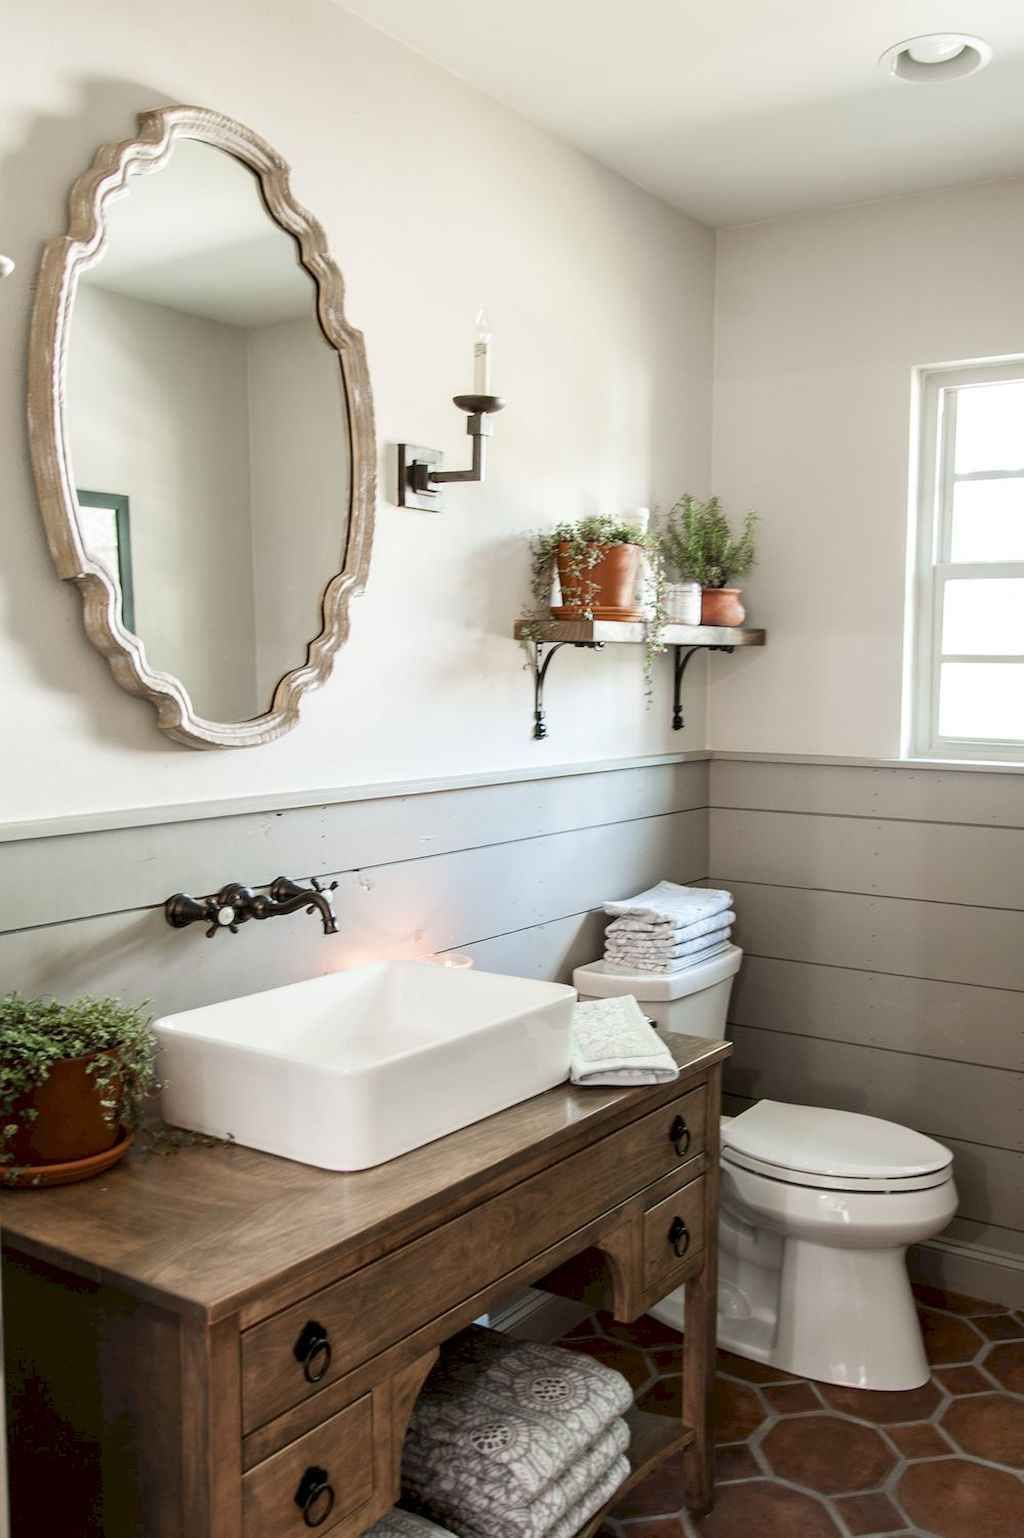 55 vintage farmhouse bathroom remodel ideas on a budget on bathroom renovation ideas on a budget id=37030